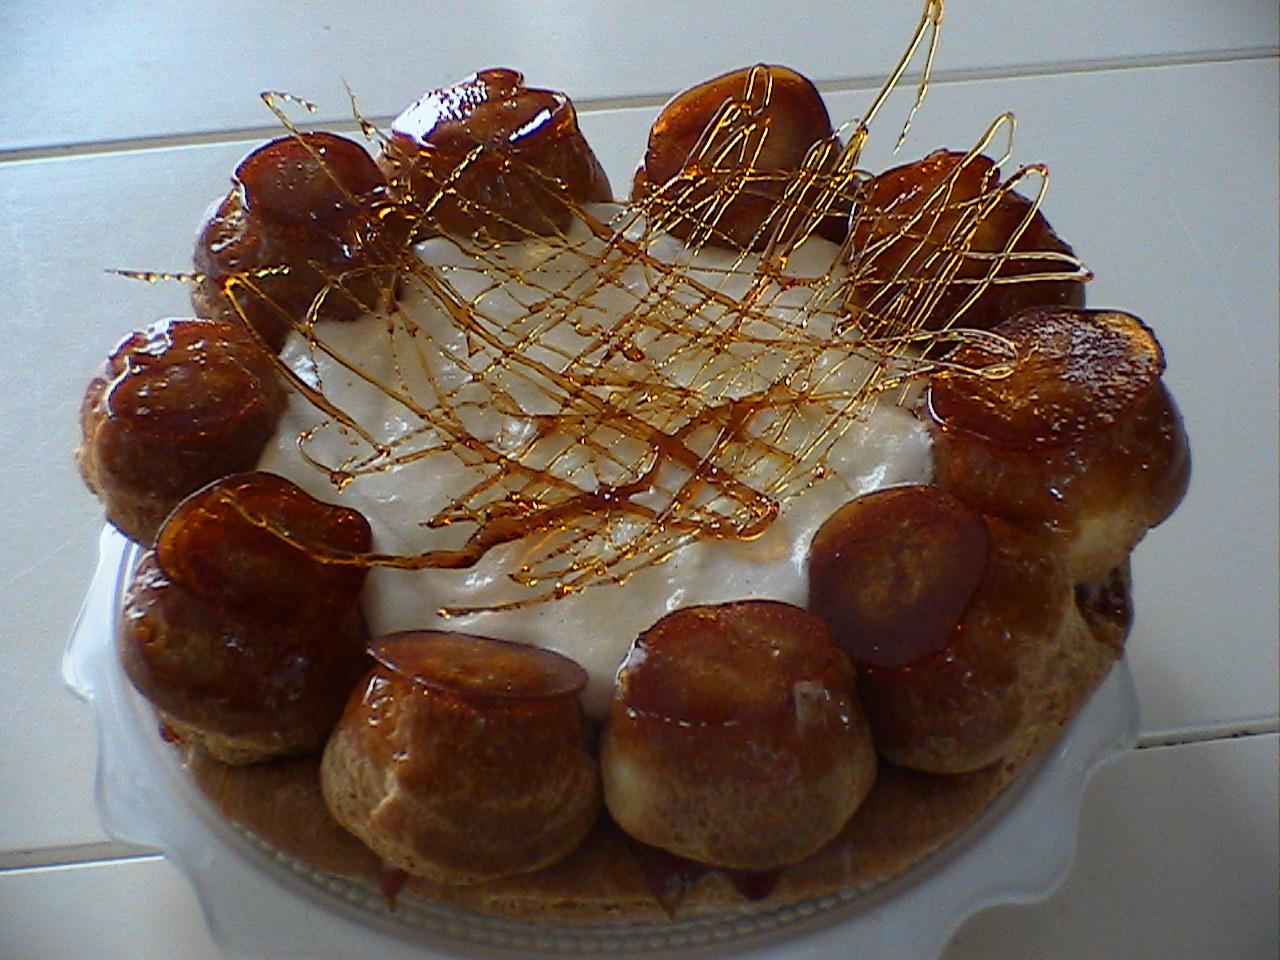 st honoré taart De Saint Honoré taart; Prachtige klassieker | Lekker Tafelen st honoré taart